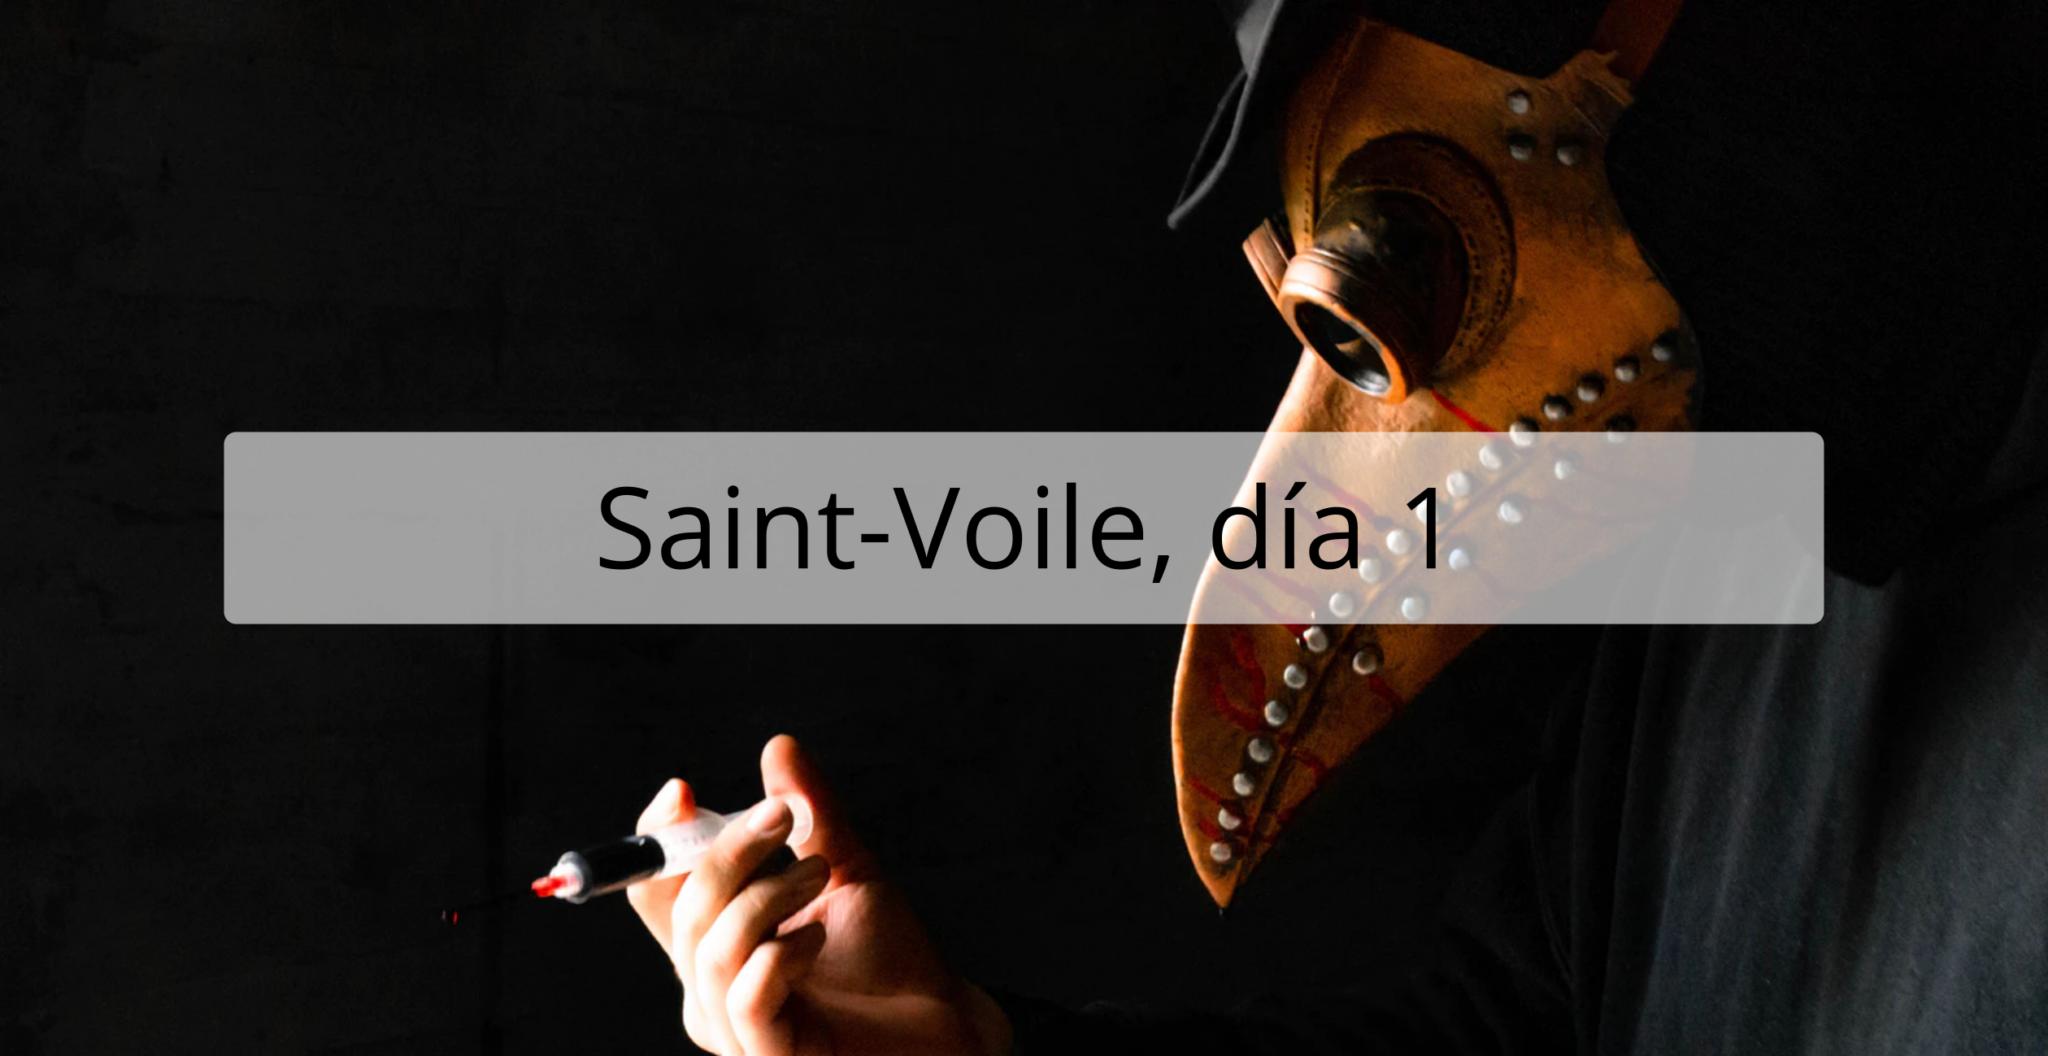 Resistencia Lúdica - Saint-Voile, día 1 (Macadabre)